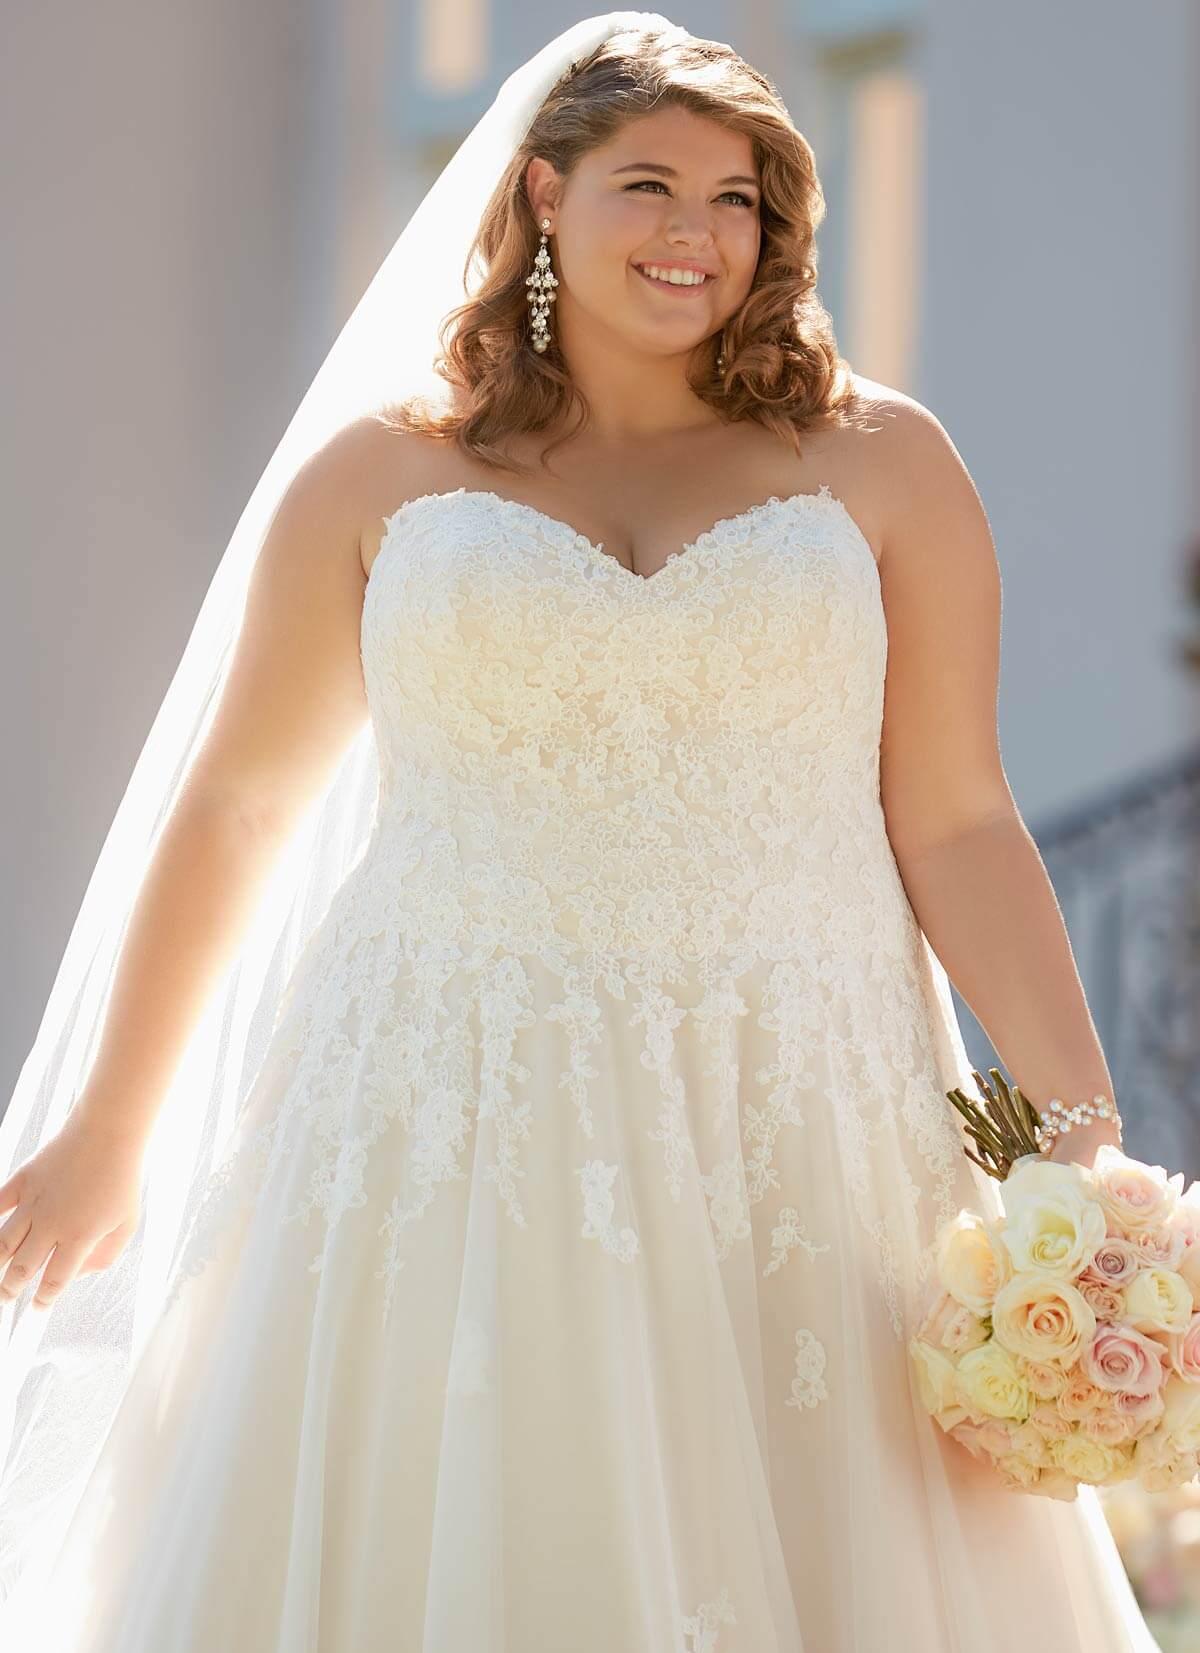 76e744620f7 Plus-Size Wedding Dresses in Kansas City